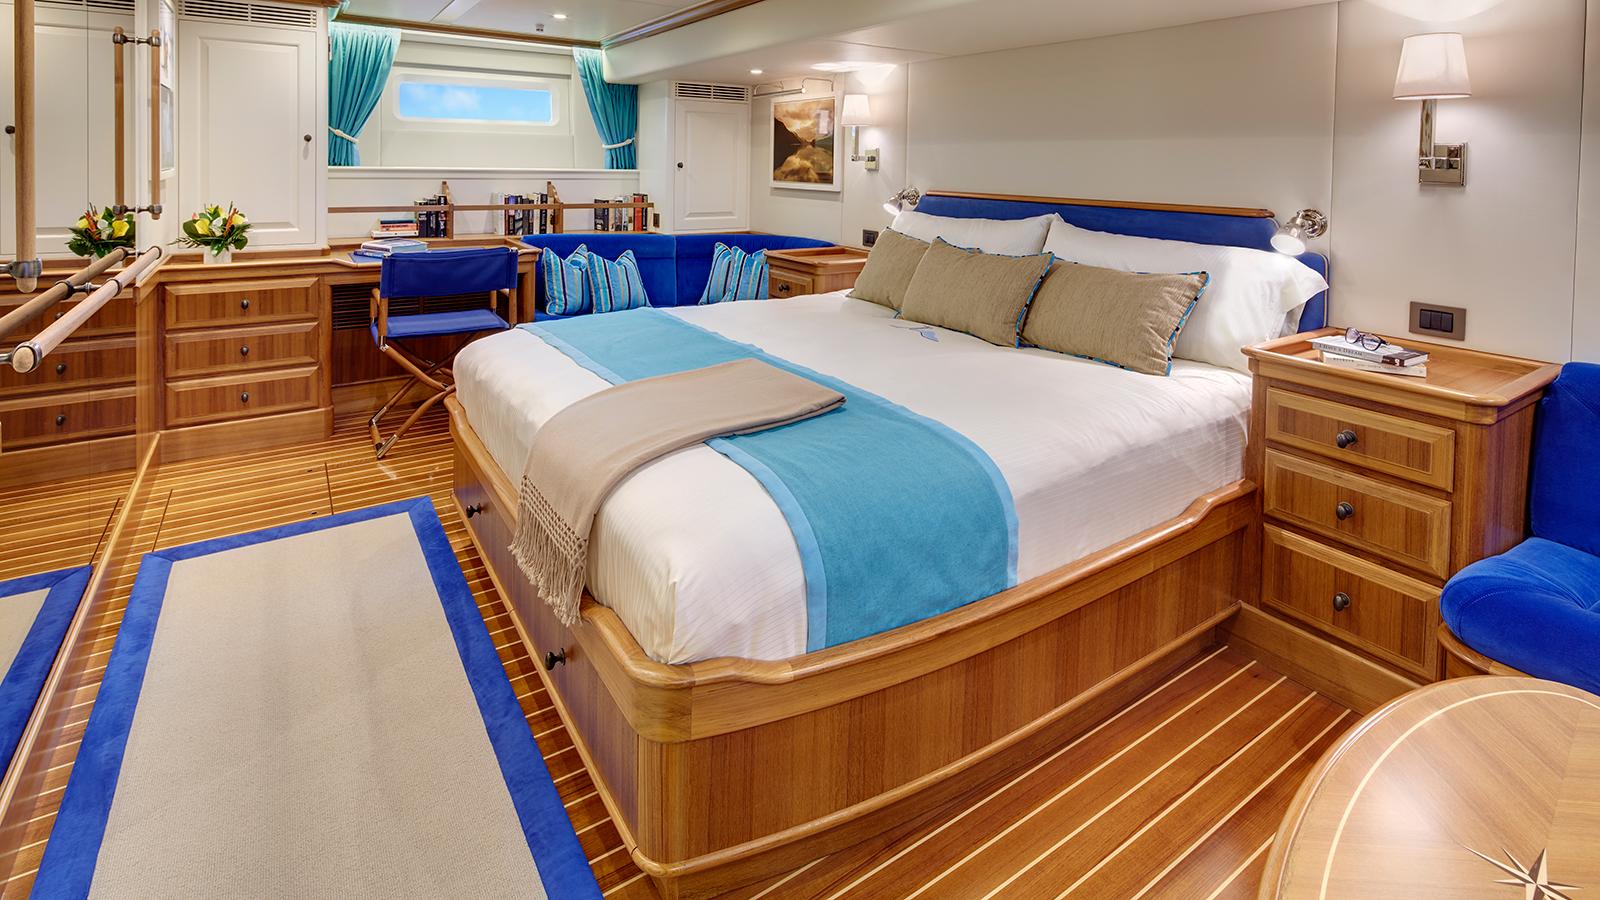 the-master-cabin-on-yachting-developments-sailing-super-yacht-cygnus-montanus